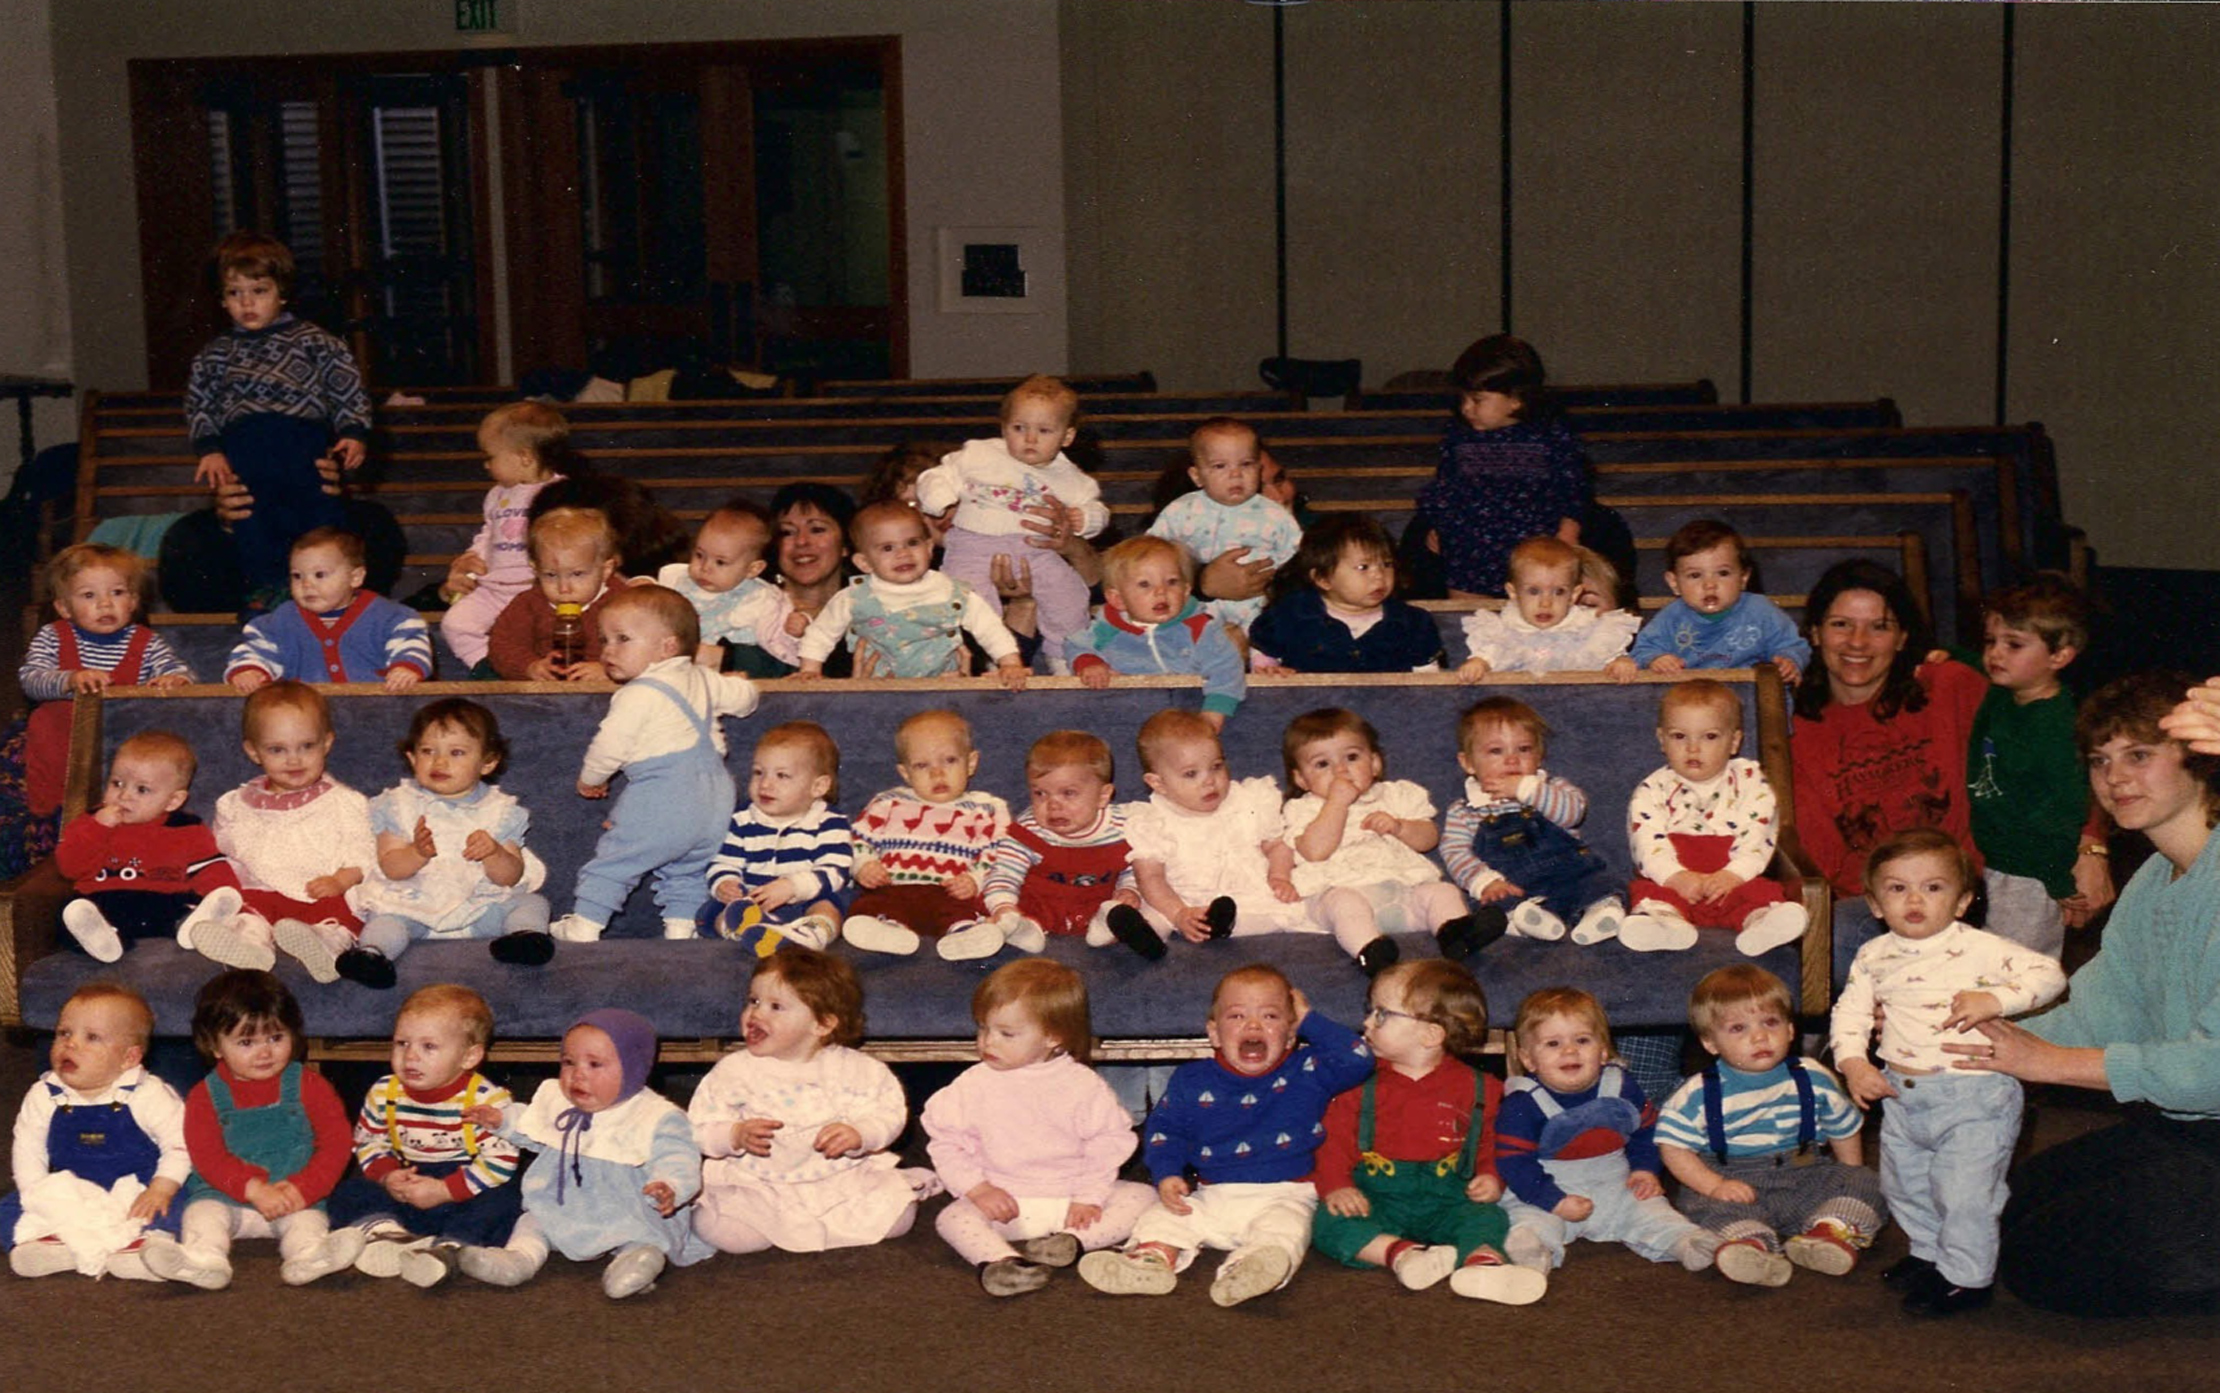 FHHS Class of 2006 - Kathleen Ballard photo